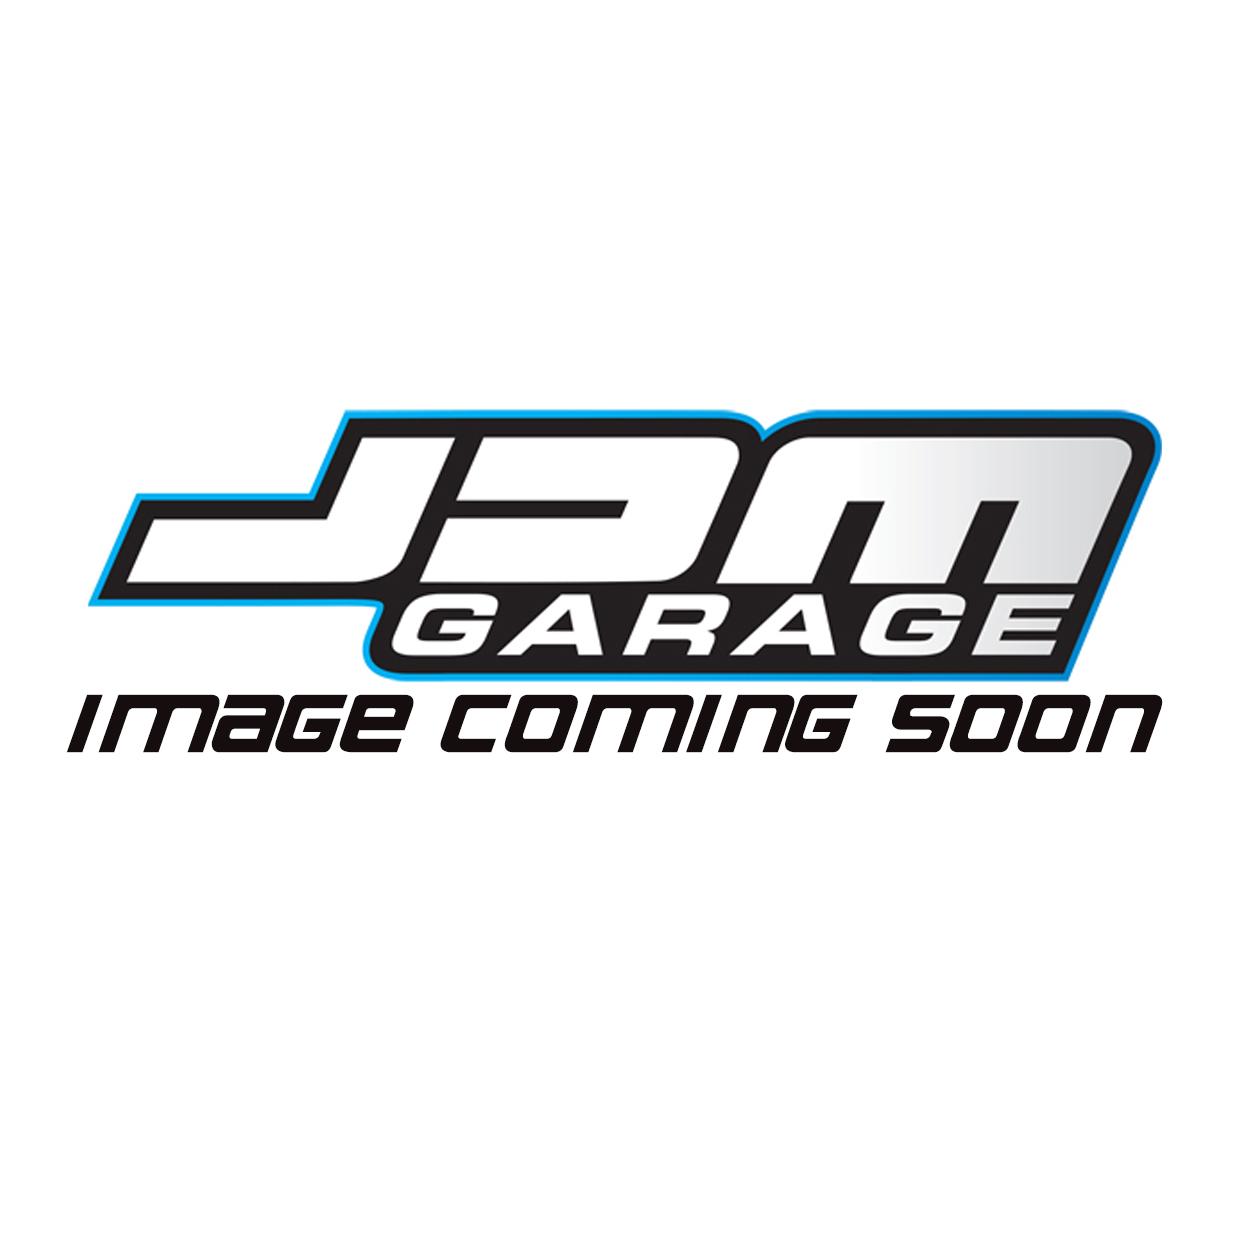 engine jdm garage uk nissan specialists Subaru BRZ Engine genuine nissan engine gasket set r35 gtr vr38dett a0101 jf00a